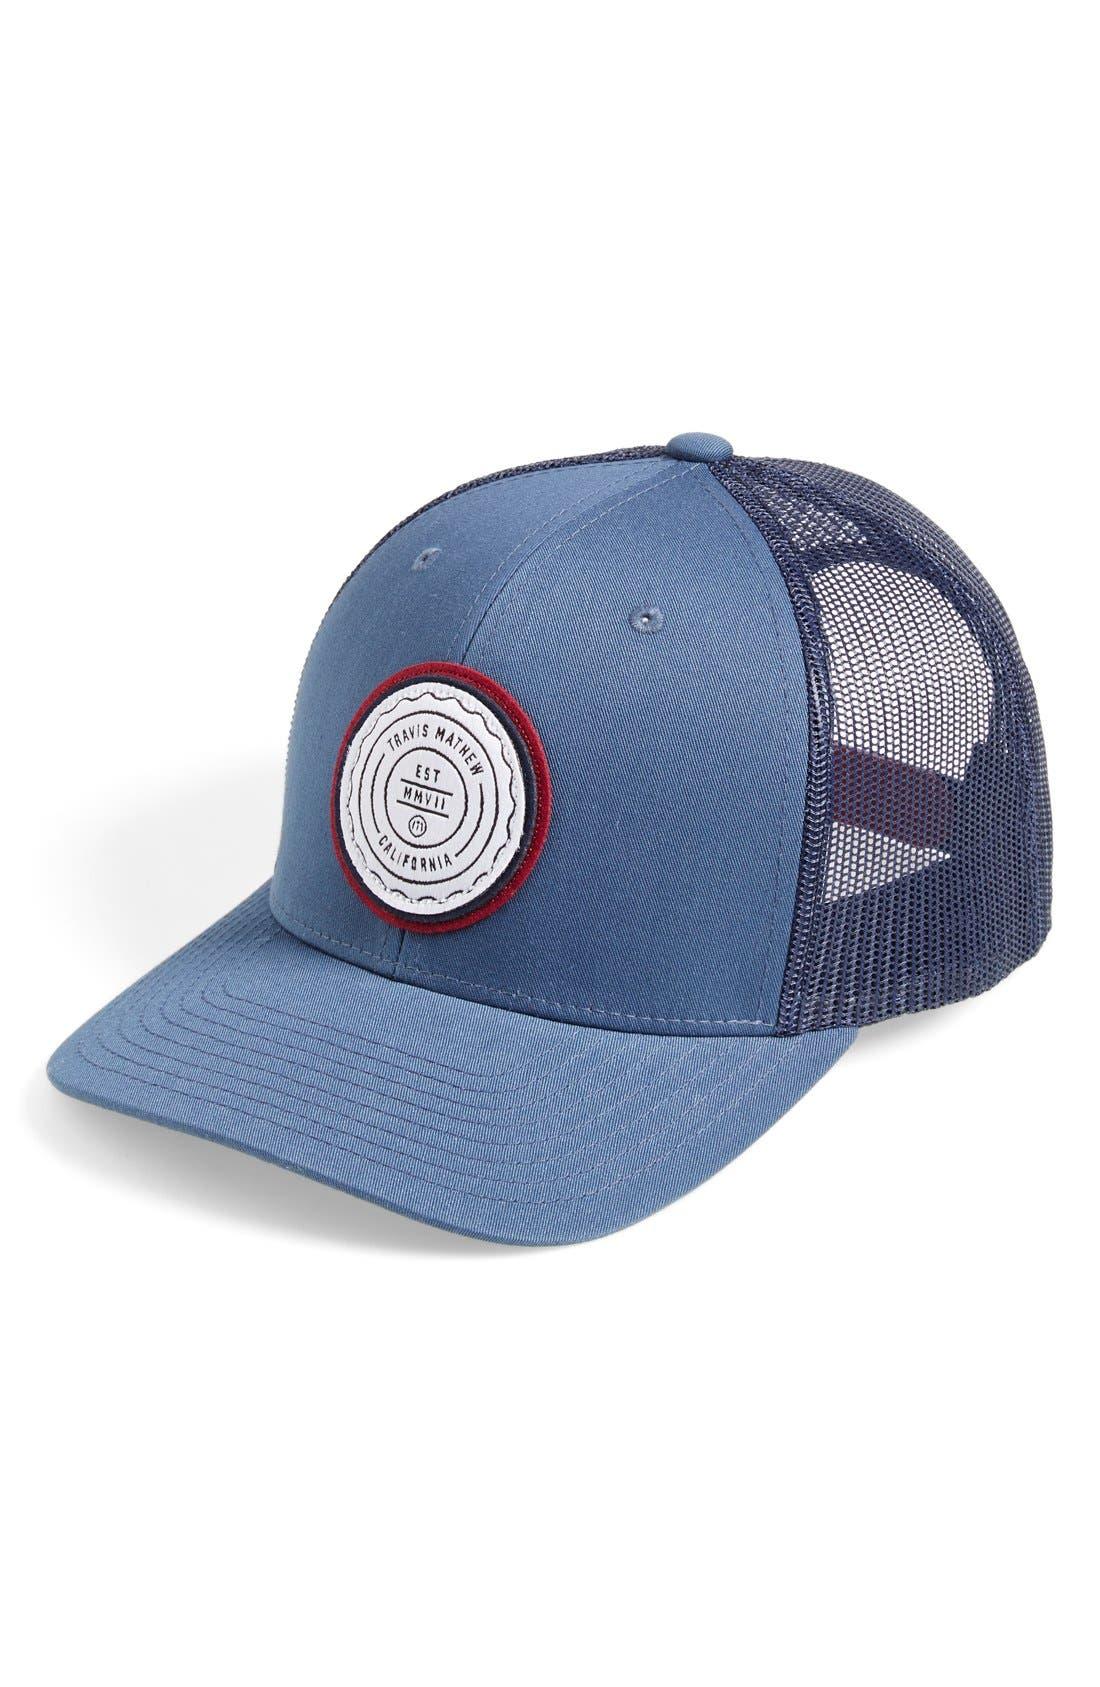 Alternate Image 1 Selected - Travis Mathew 'Fringe' Trucker Hat